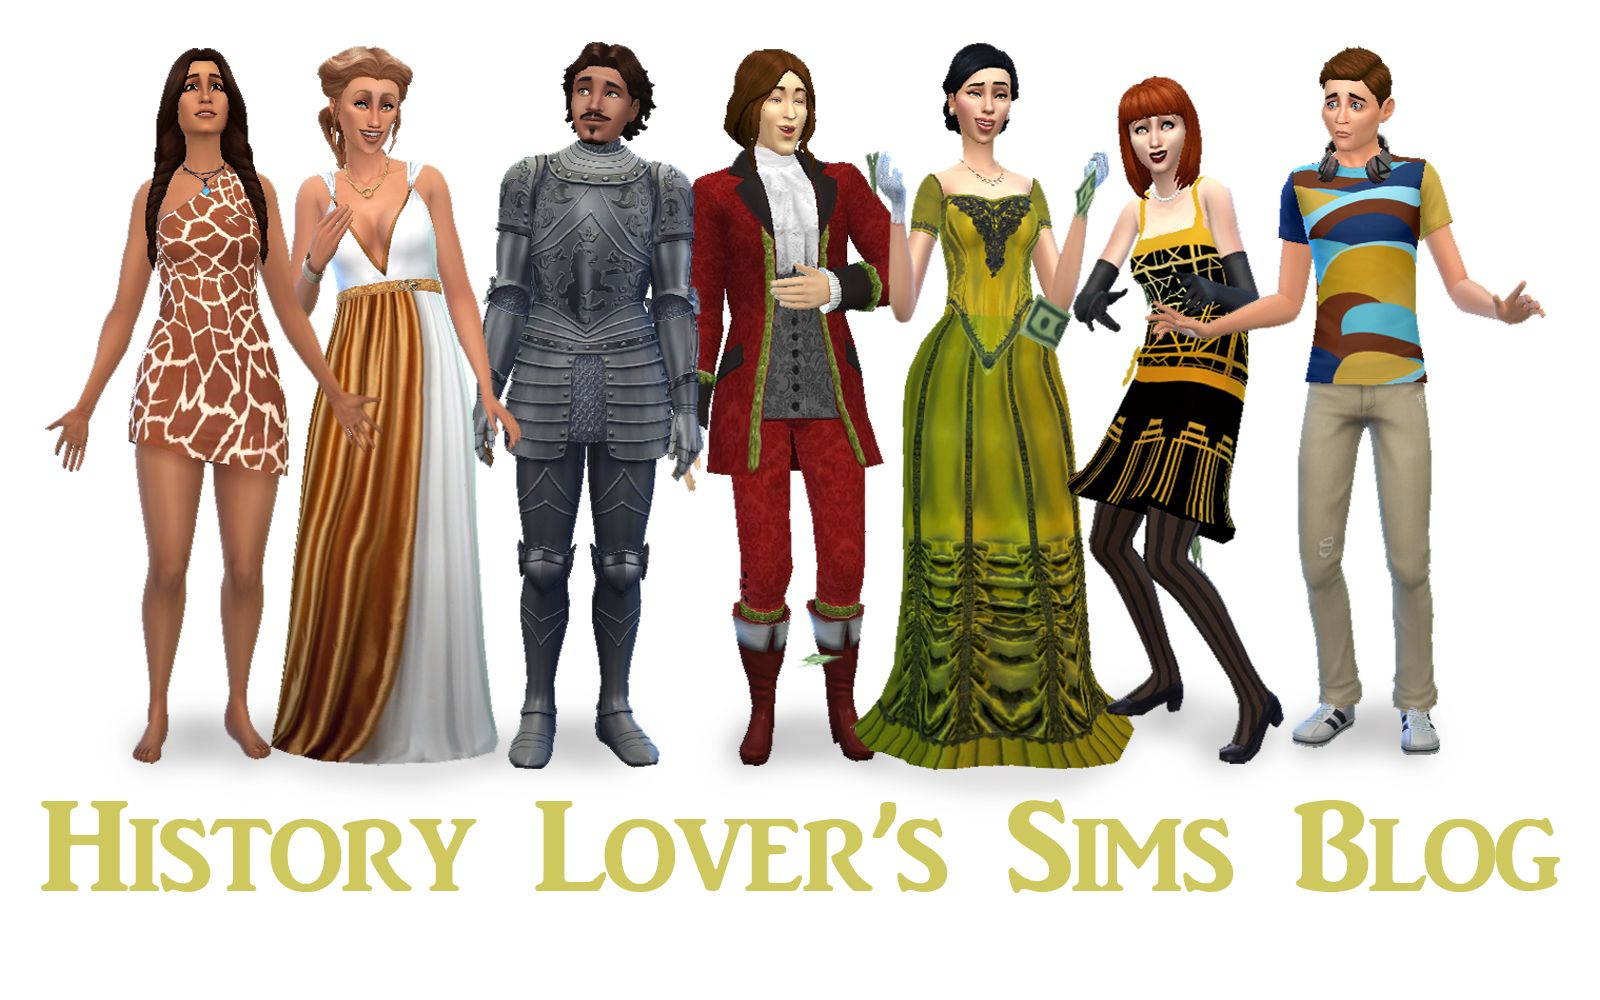 Sims 4 Historical Cc